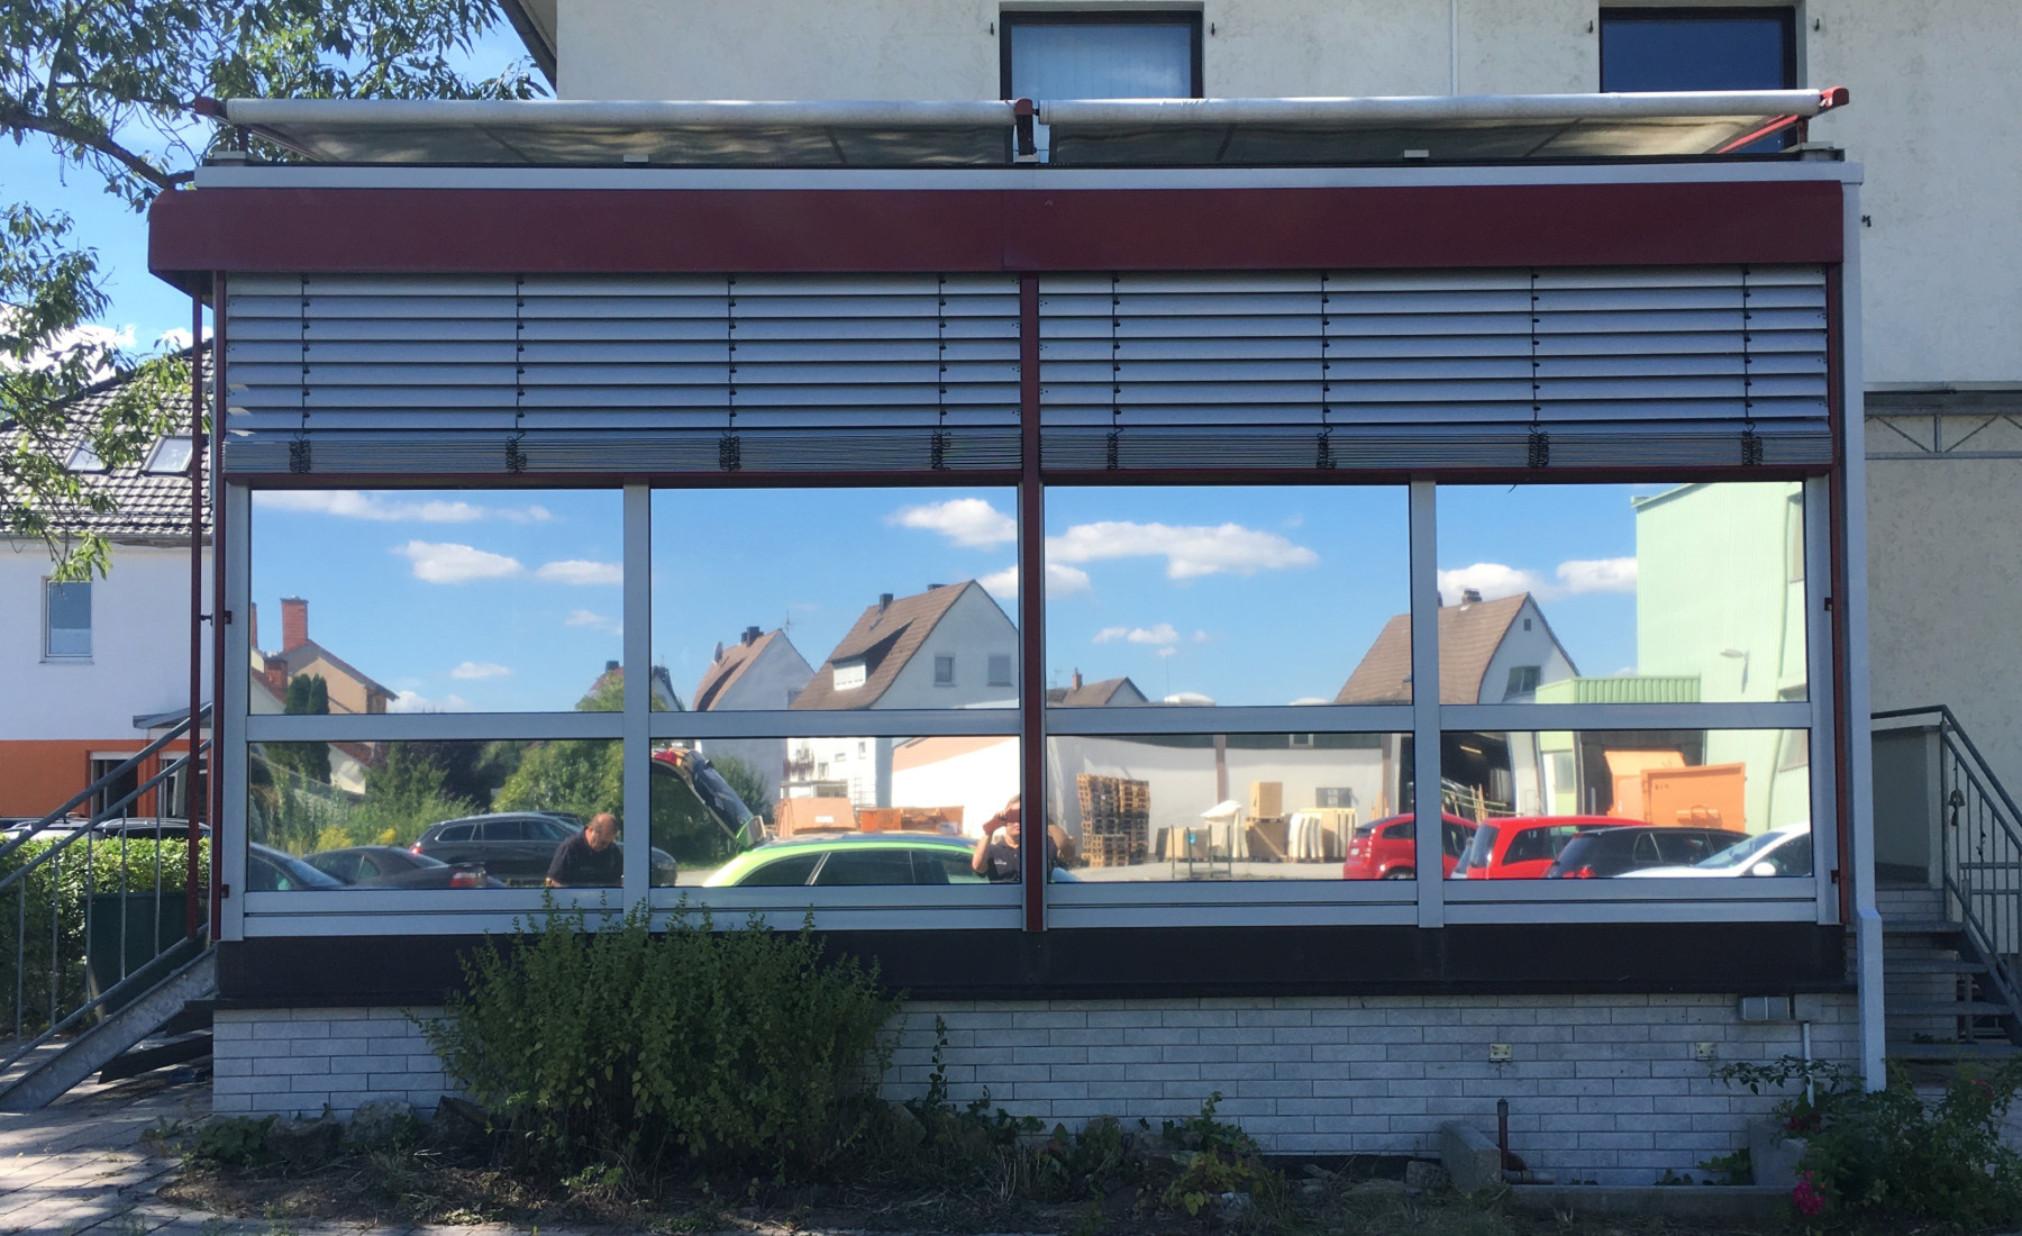 Oschmann, Betten, CarStyleSuhl, Fenster